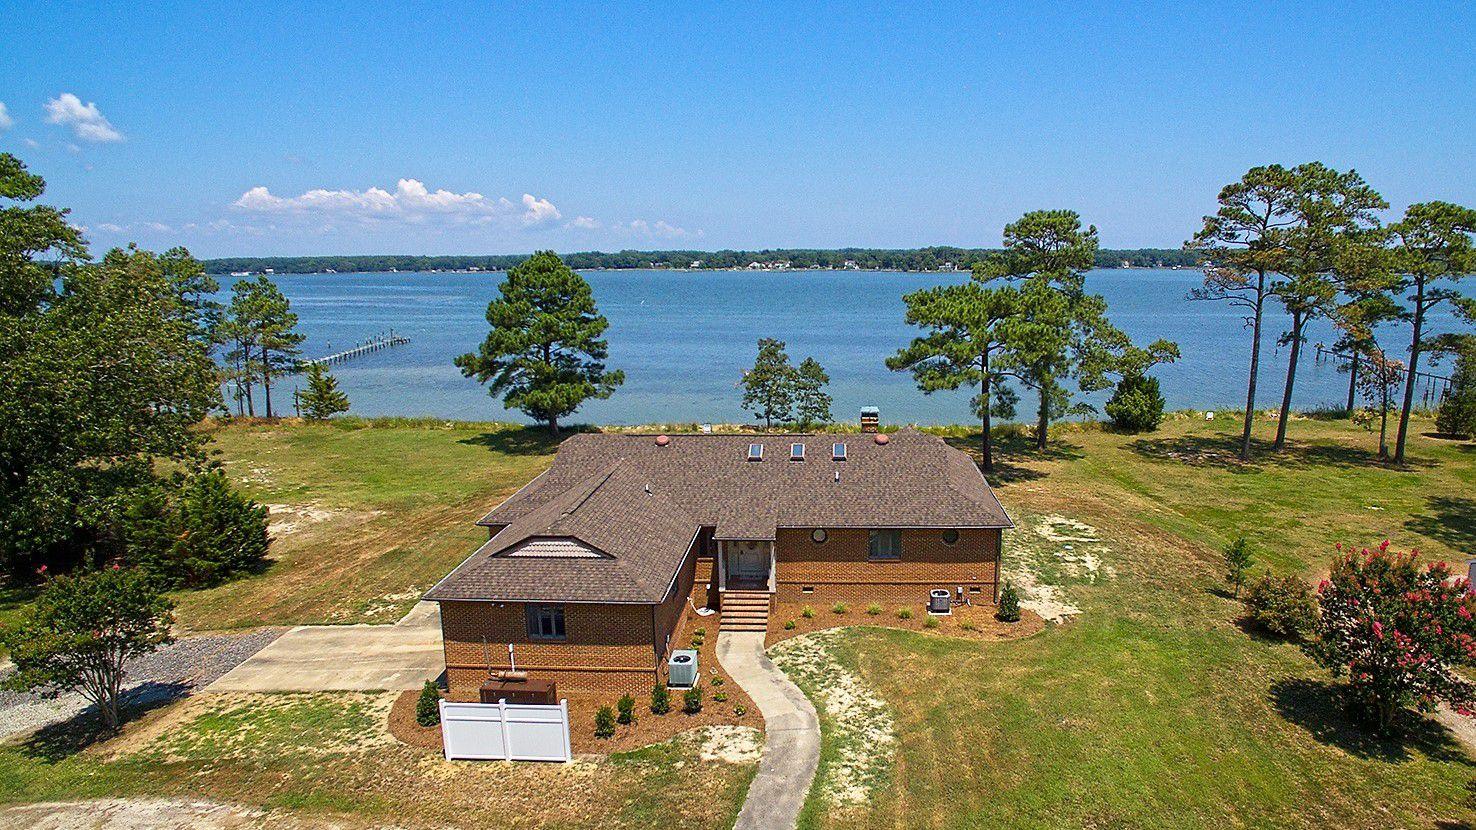 1397 Point Breeze Rd, Mathews, VA 23109 - Estimate and Home Details ...